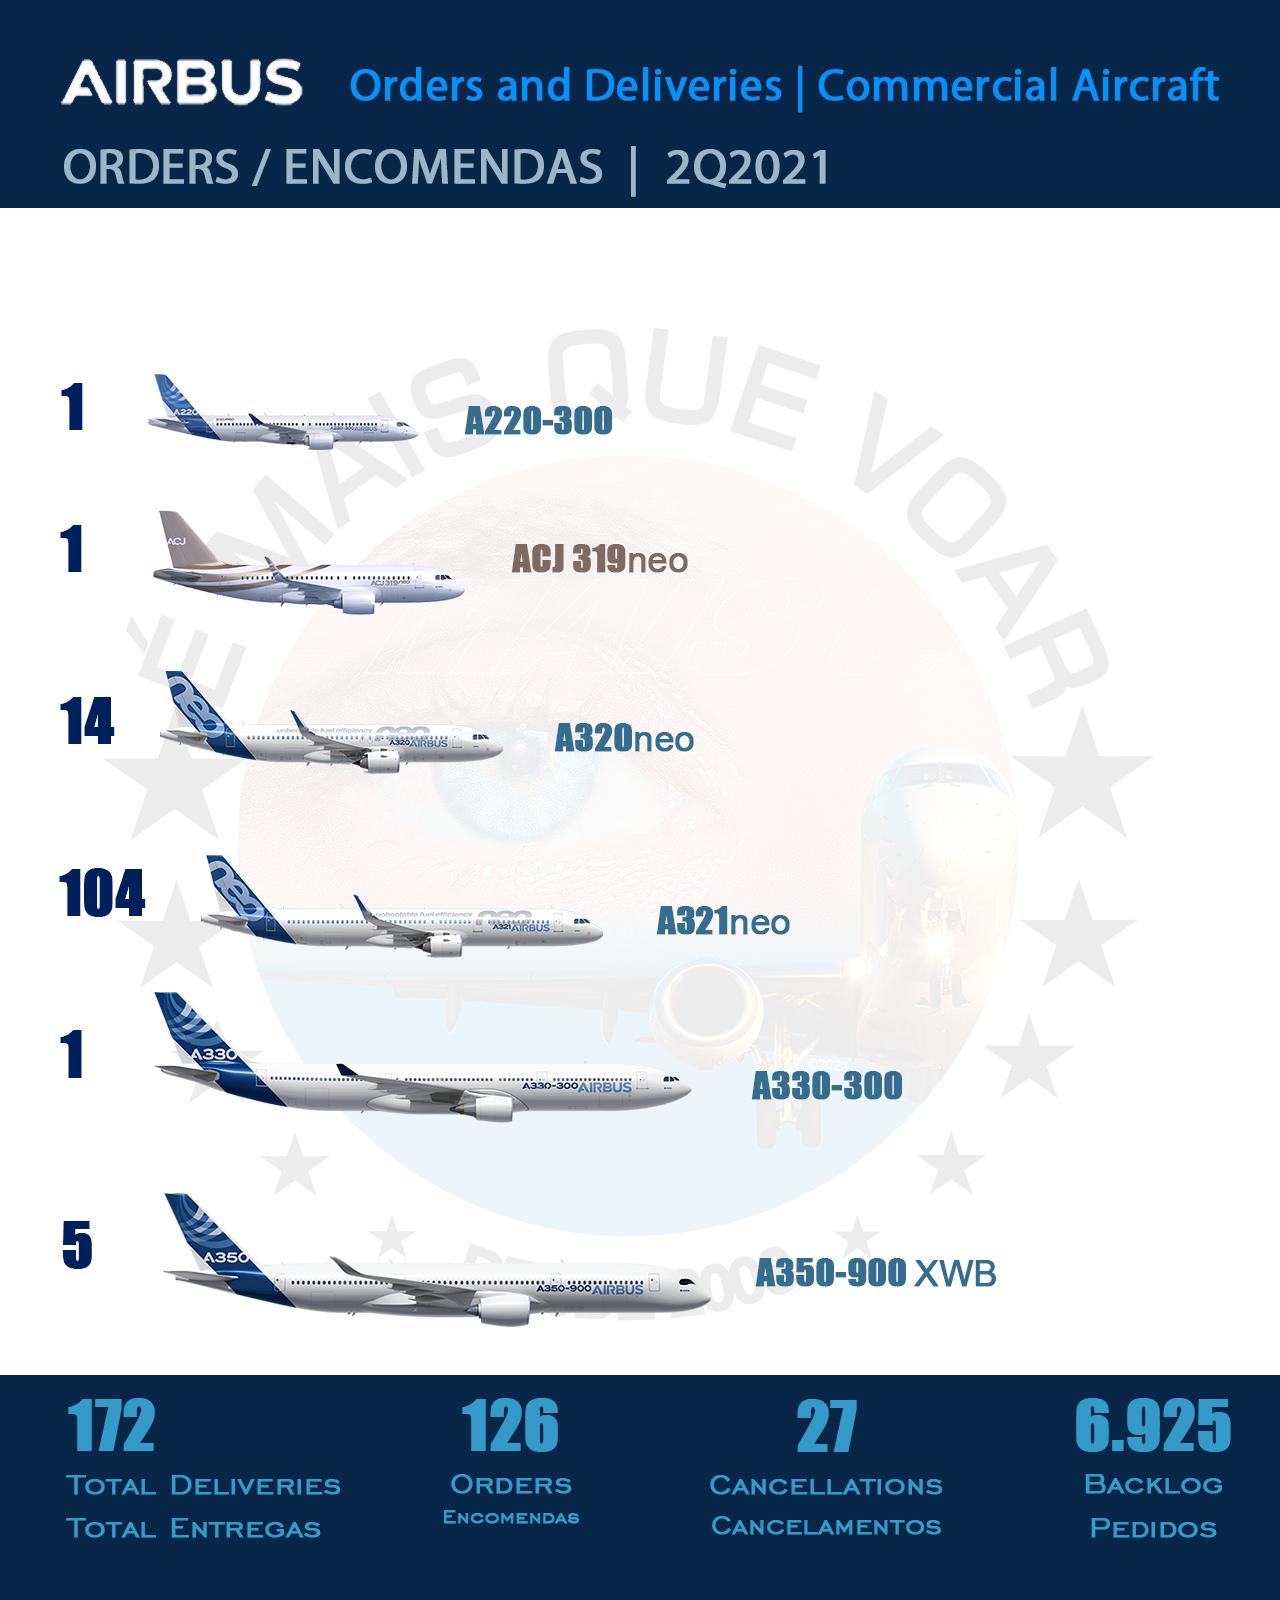 Airbus - encomendas de aeronaves no Segundo Trimestre de 2021 (2T2021)